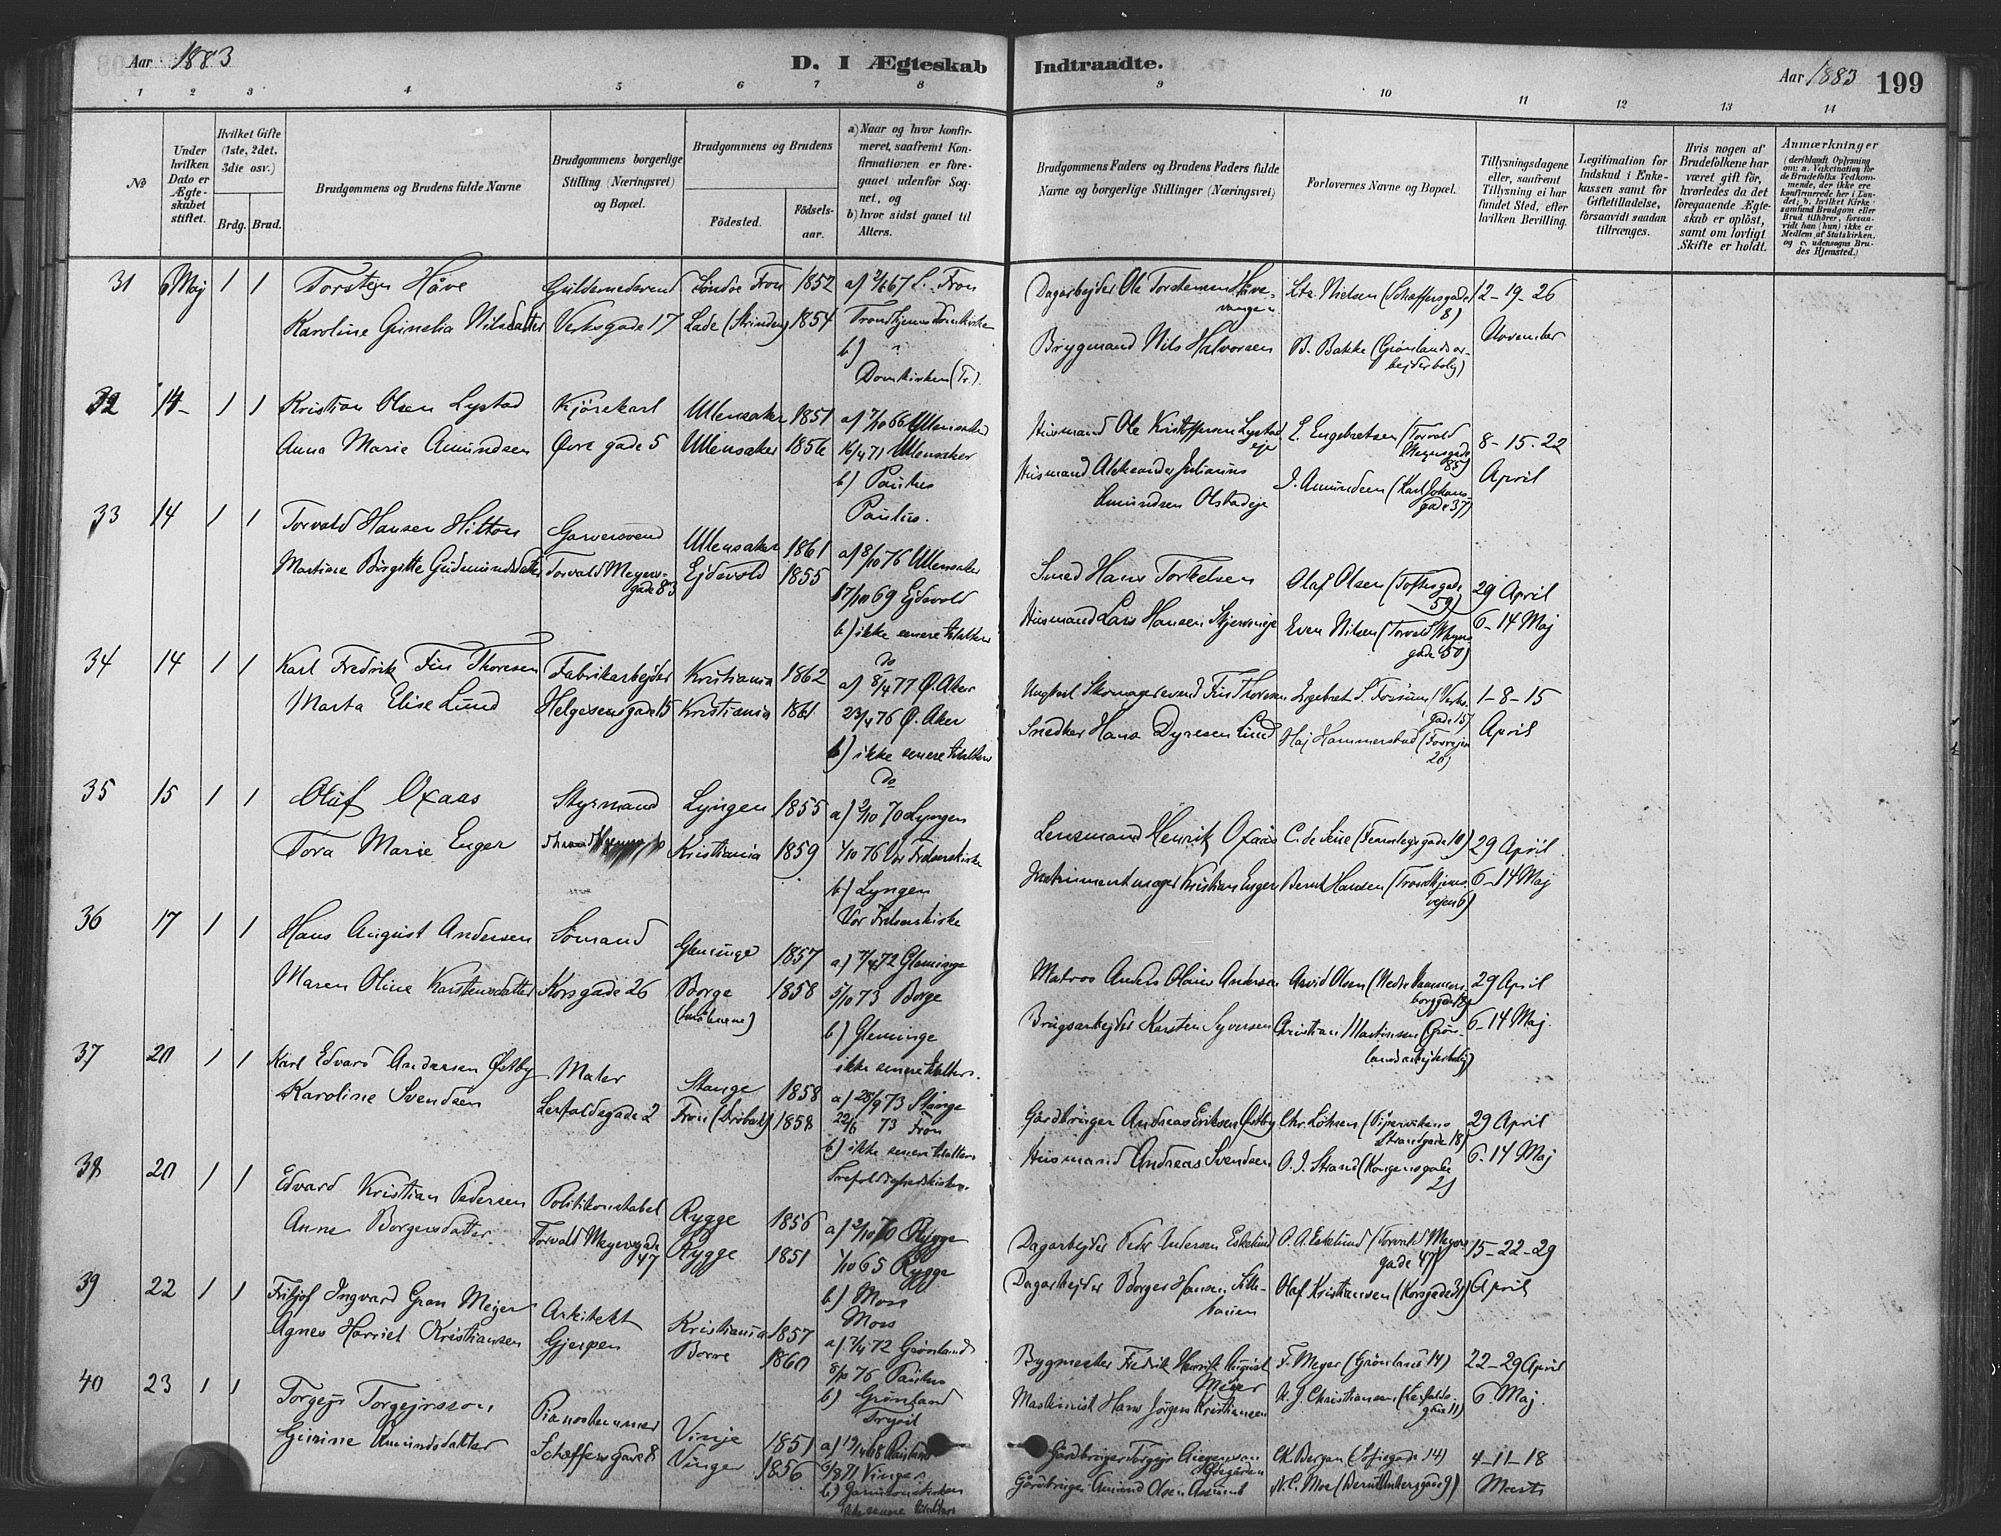 SAO, Paulus prestekontor Kirkebøker, F/Fa/L0004: Ministerialbok nr. 4, 1879-1891, s. 199